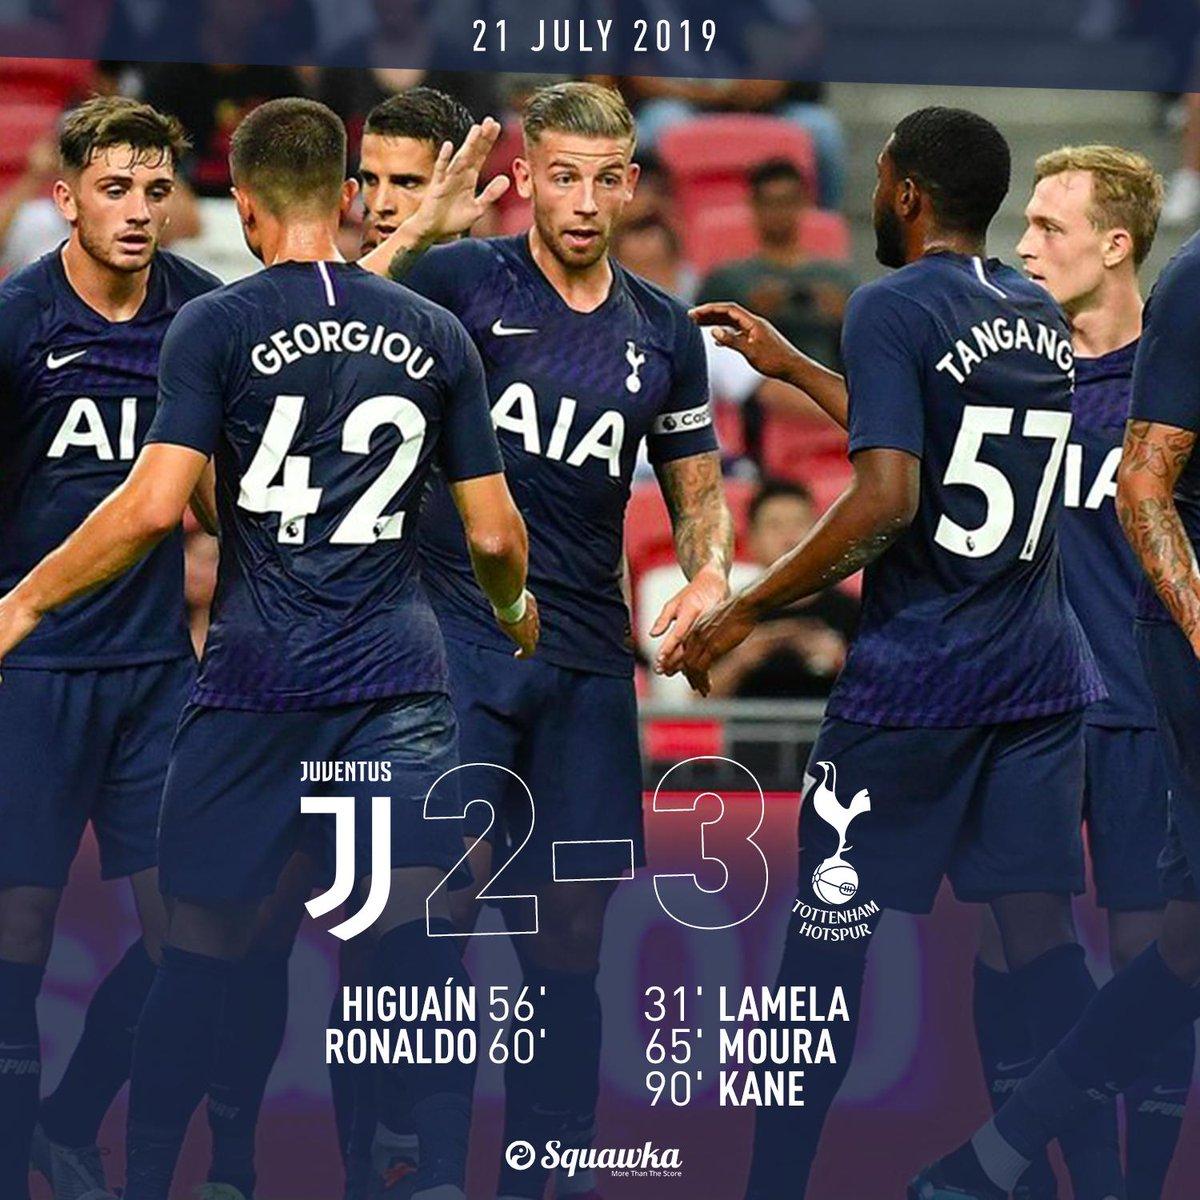 Juventus 2-3 Spurs FT:  ⚽️ Lamela ⚽️ Higuaín ⚽️ Ronaldo ⚽️ Lucas ⚽️ Kane  Harry Kane scores from the half-way line in stoppage time against former Arsenal goalkeeper Wojciech Szczesny. 🤯